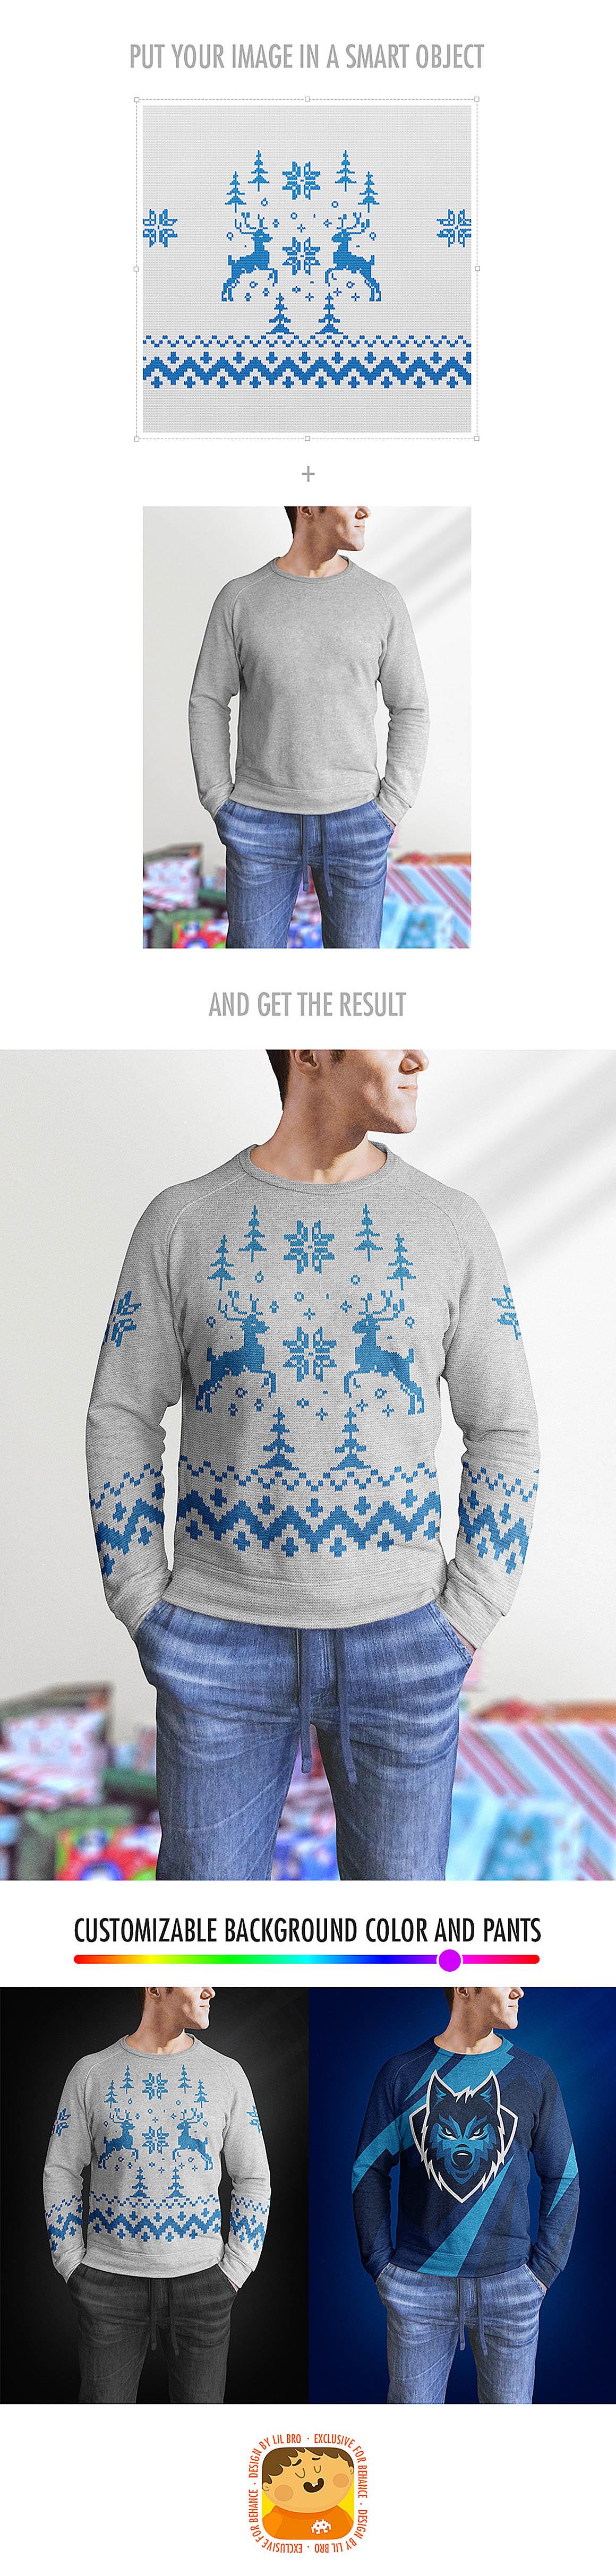 free-sweater-mockup-2